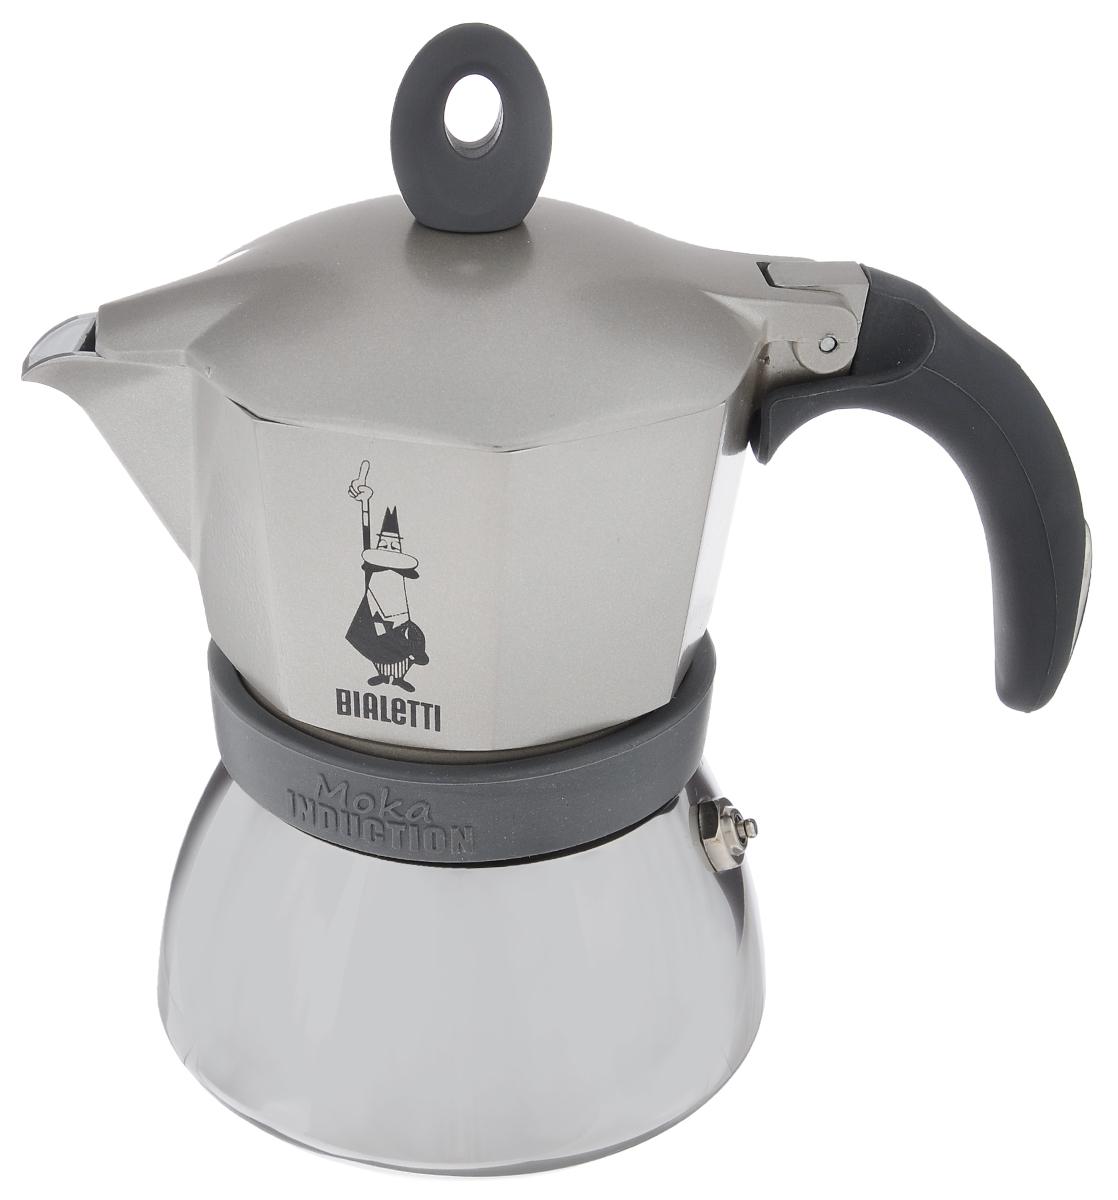 Кофеварка гейзерная Bialetti Moka Induction, цвет: серый, на 3 чашки